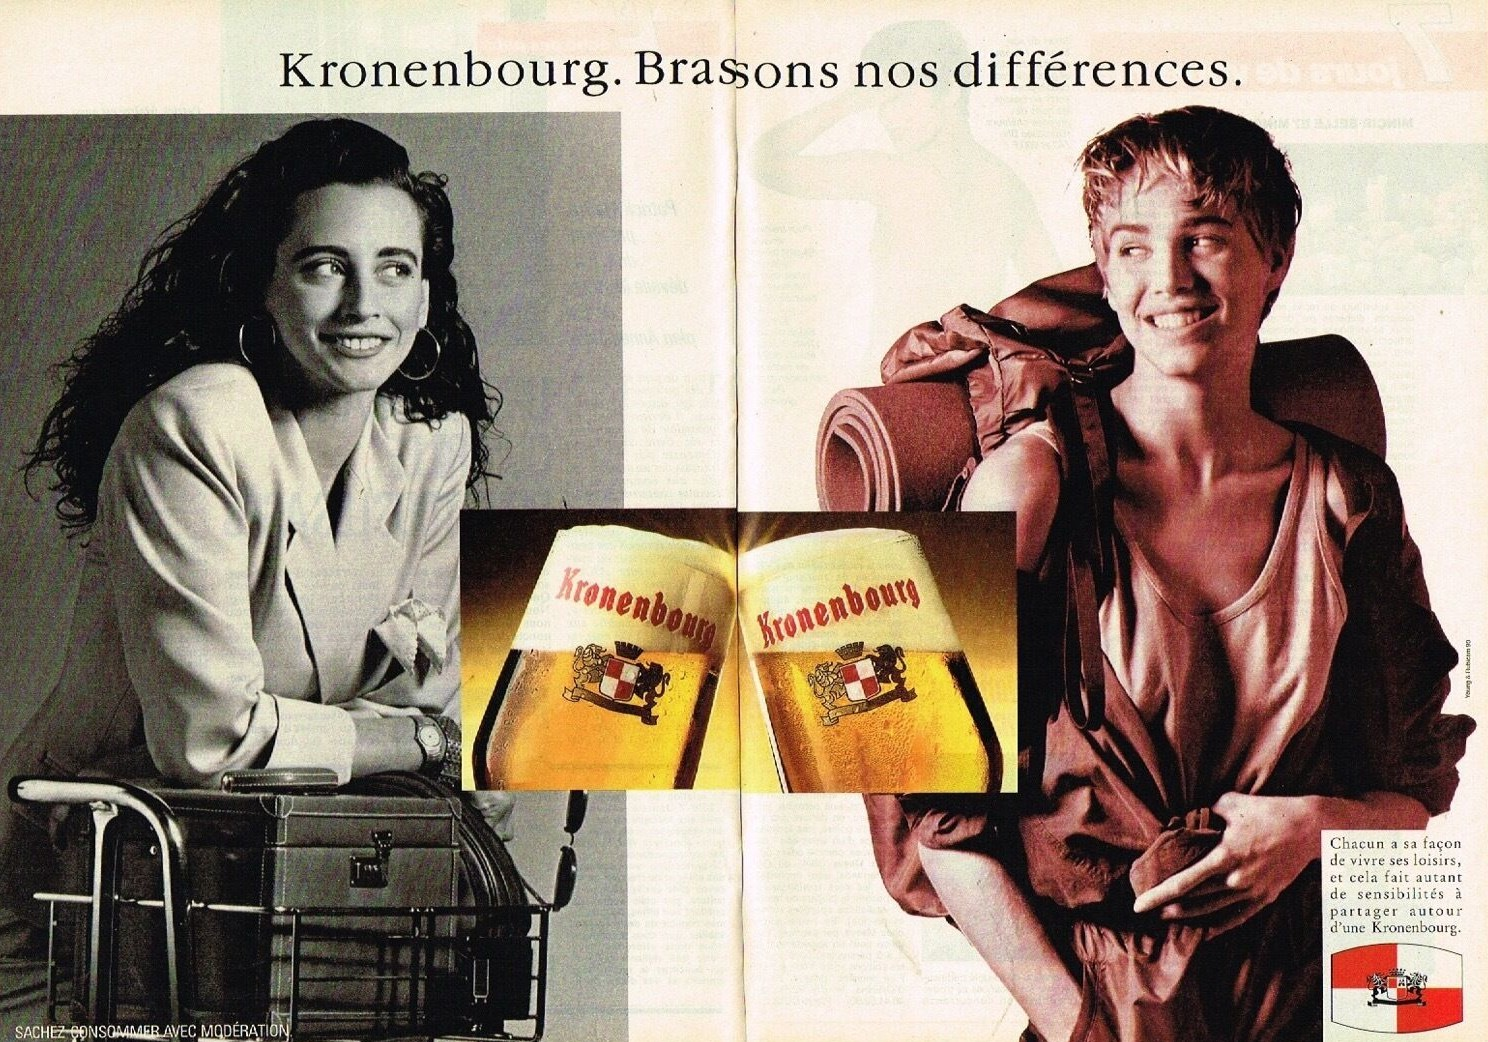 1990 La Biere Kronenbourg A3